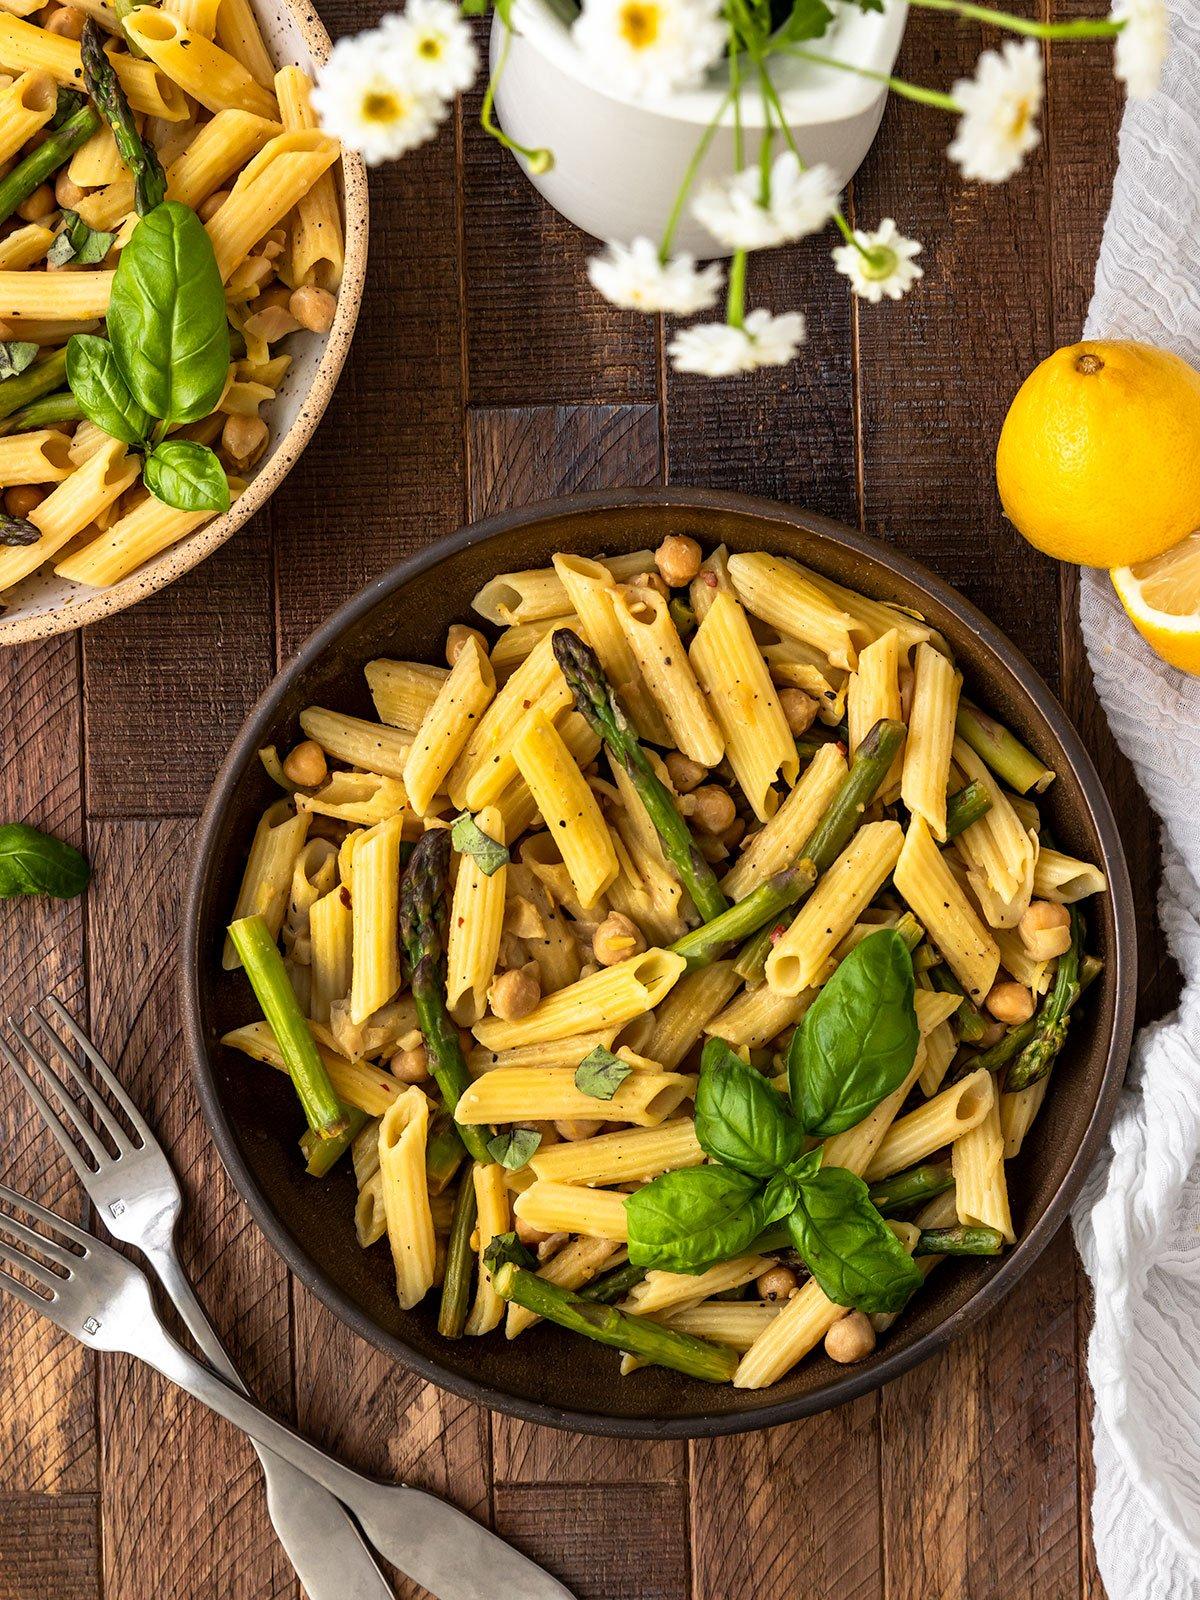 a bowl of penne with lemon sauce, asparagus, and basil